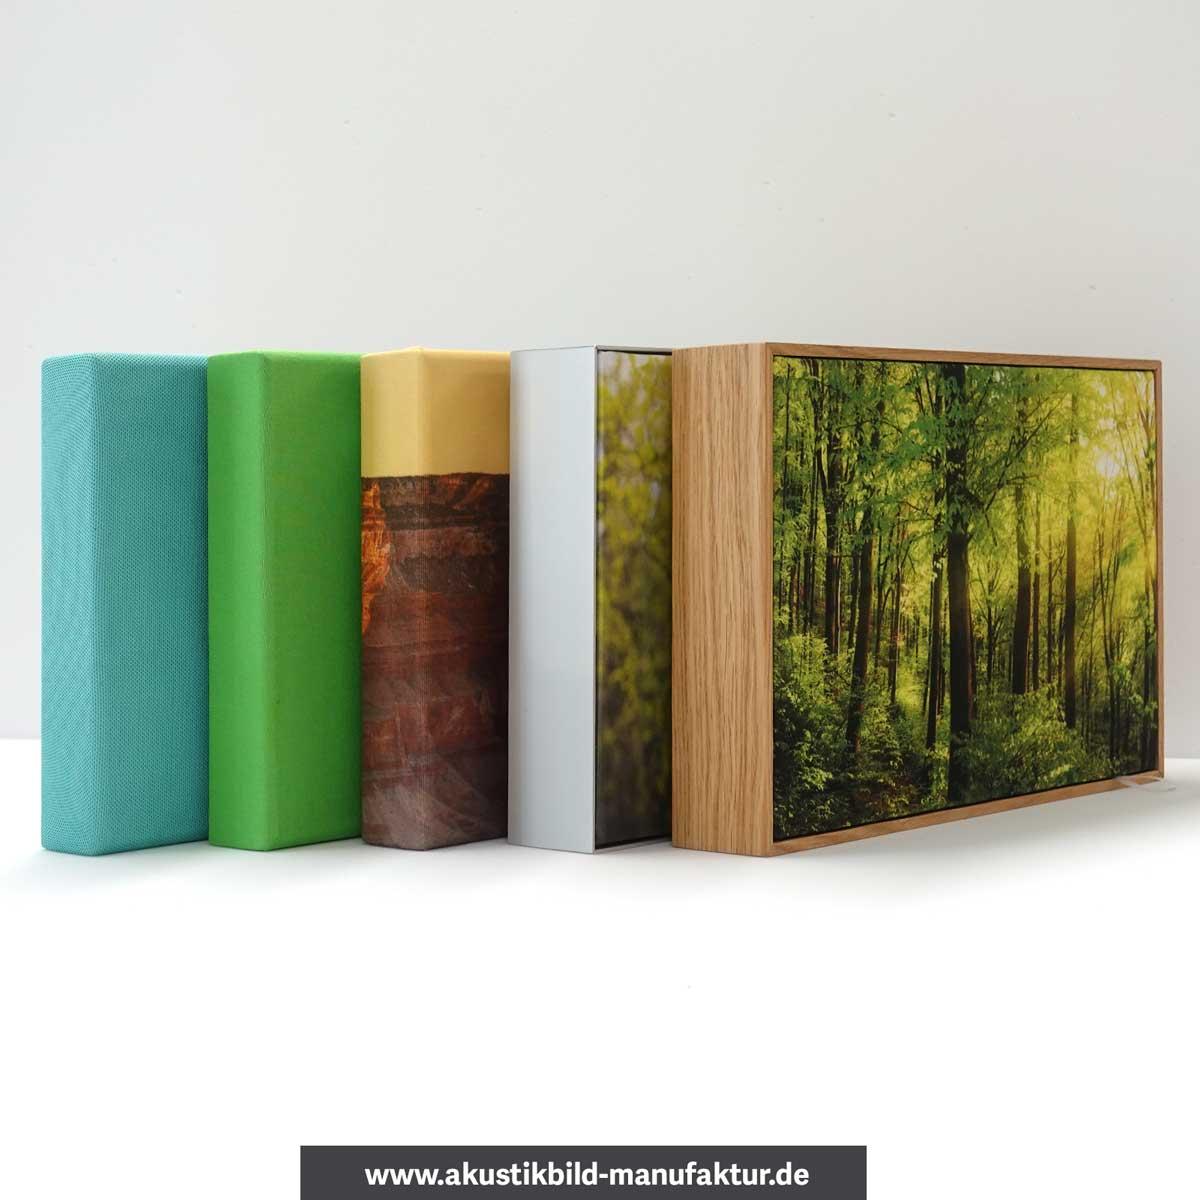 Akustikbilder Holzrahmen, Aluminiumrahmen, rahmenlos